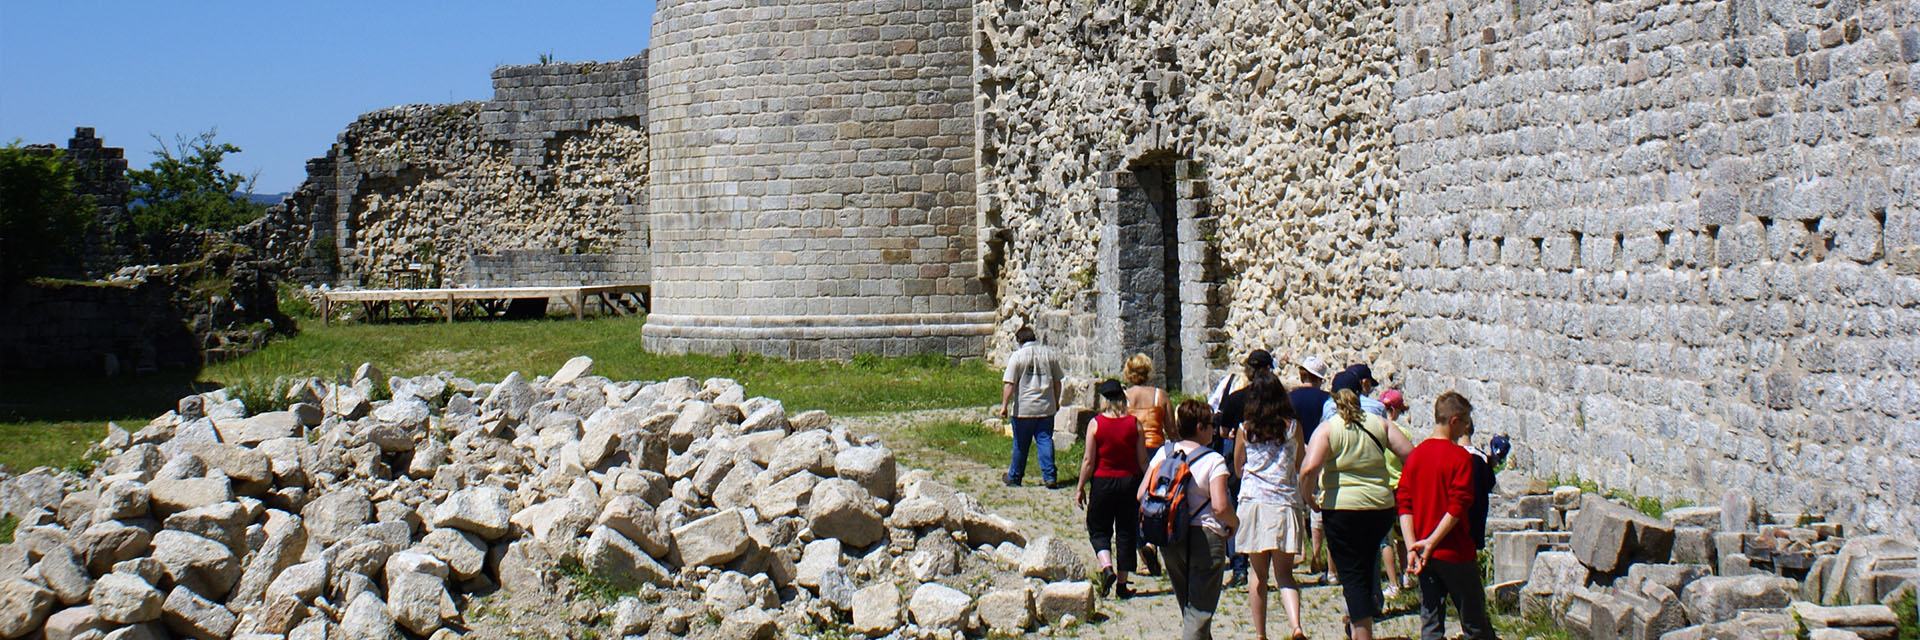 Village_club_vacances_périgord-quercy-le-lac-rando-chateau-de-ventadour